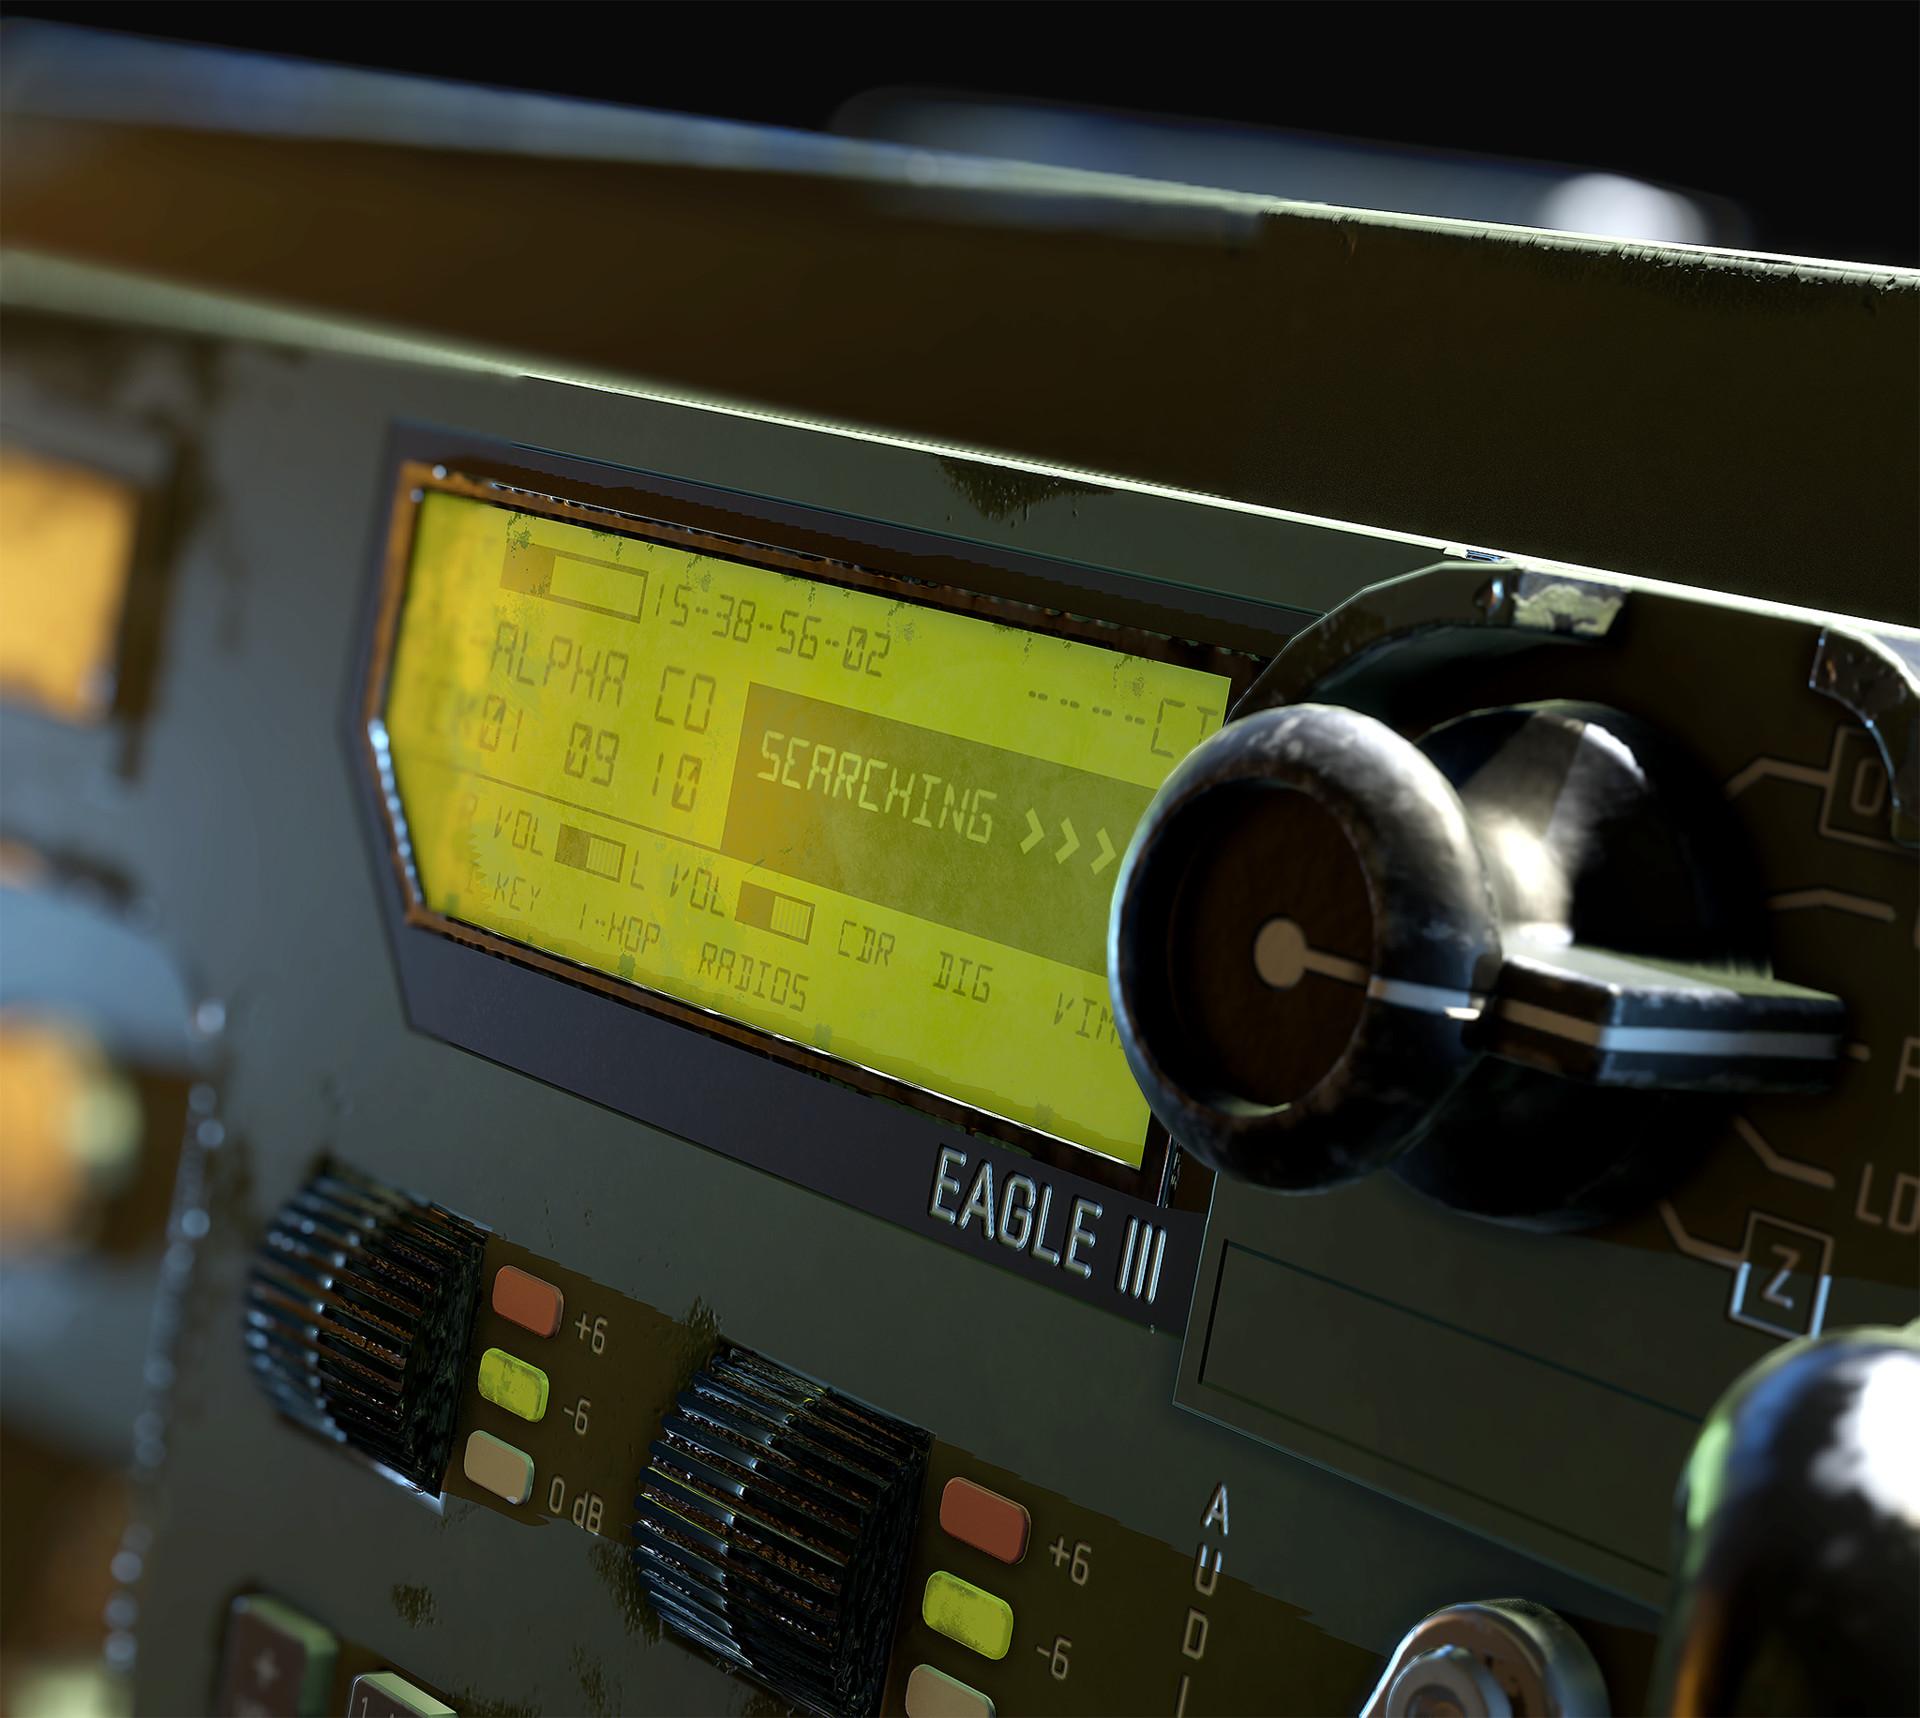 Hannu koivuranta militaryradio detail 3